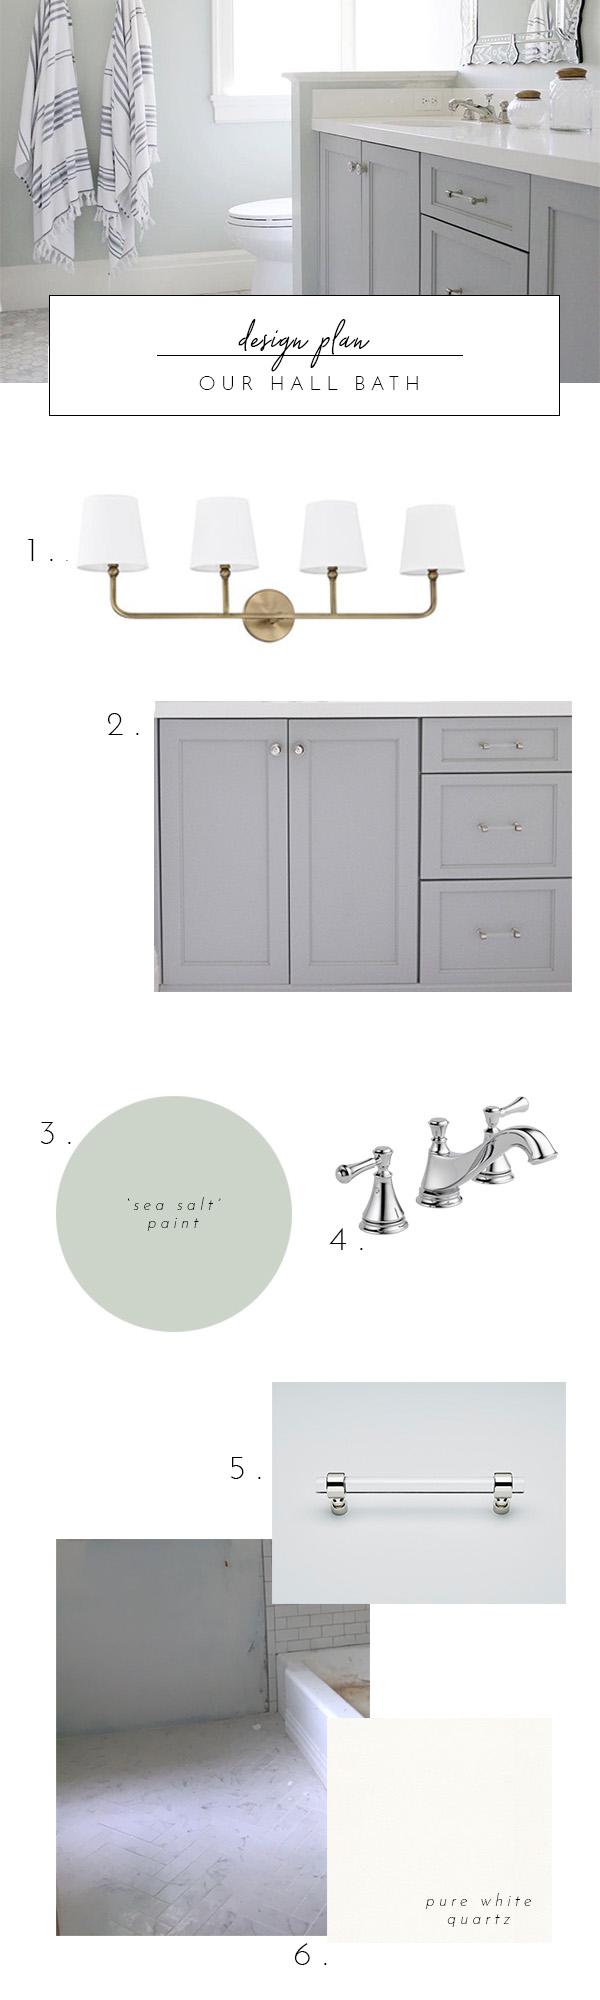 hall-bath-design-plan-bluedoorliving.jpg